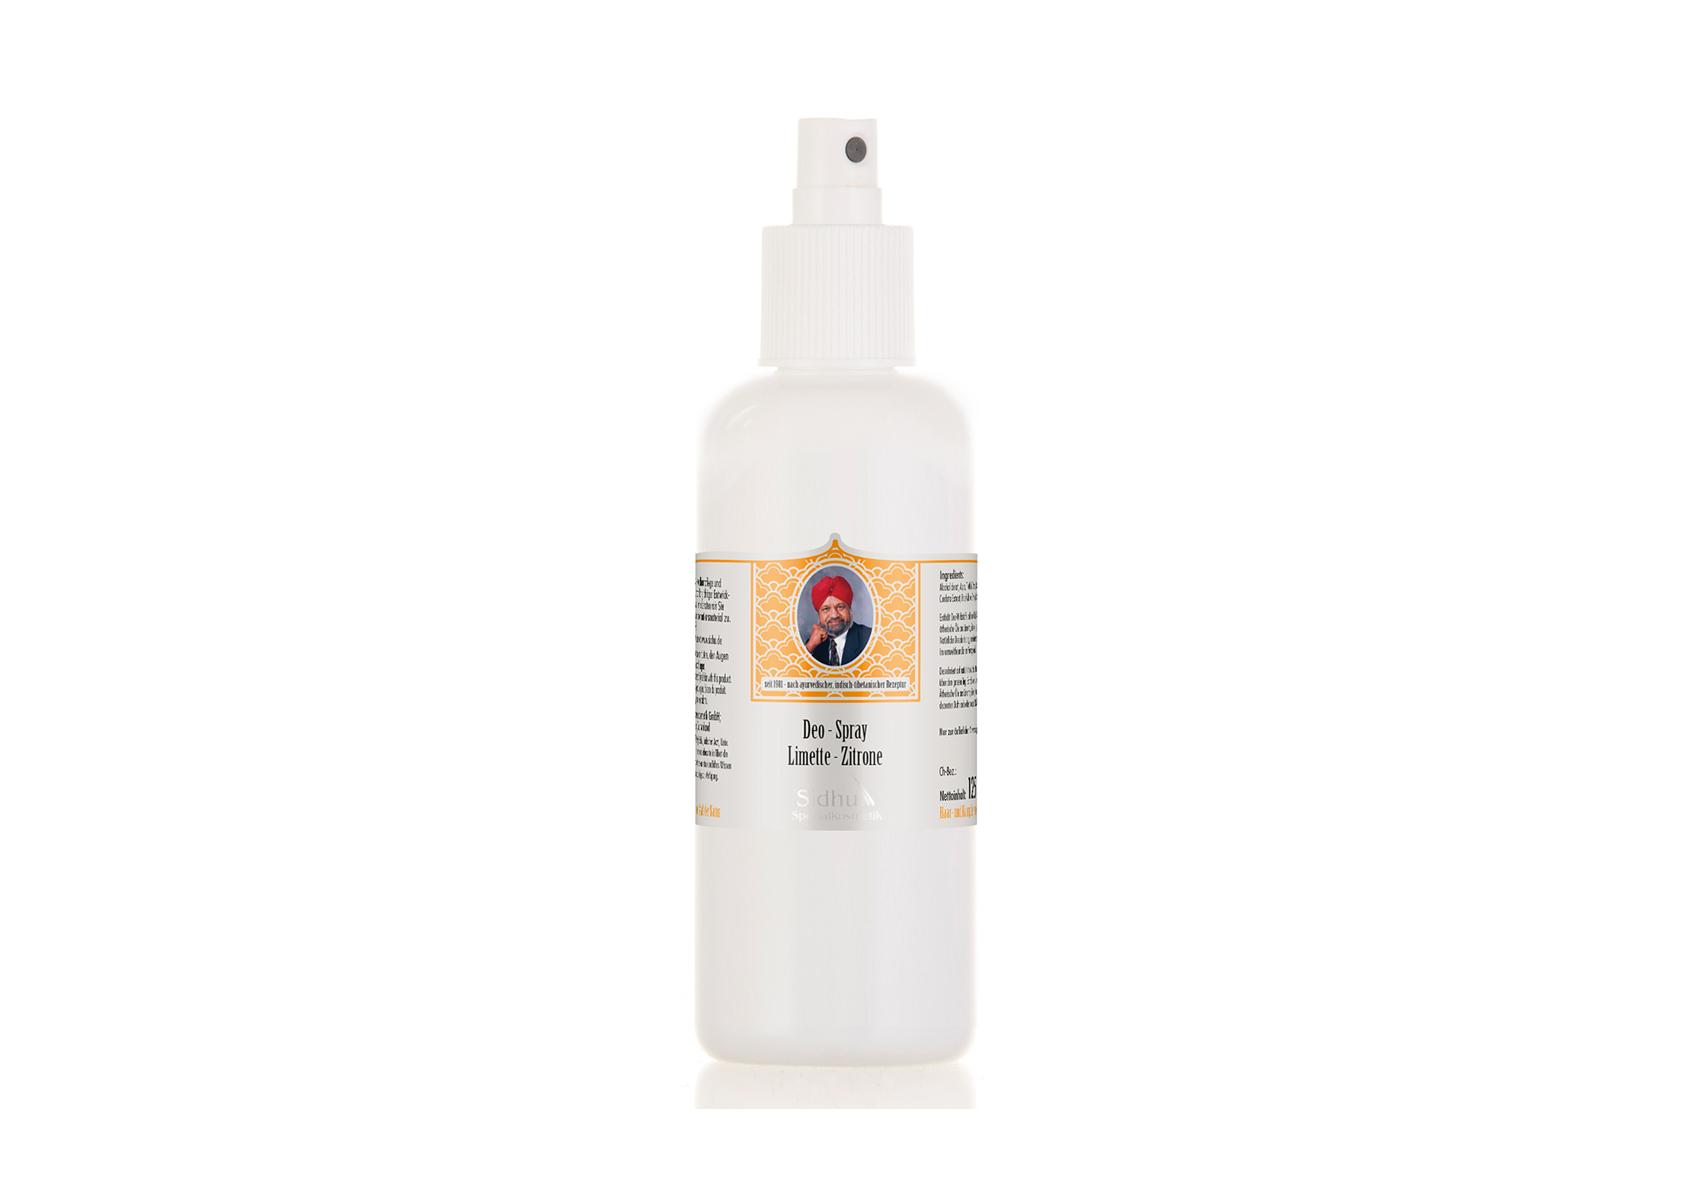 Wirksames Deo-Spray ohne Aluminium